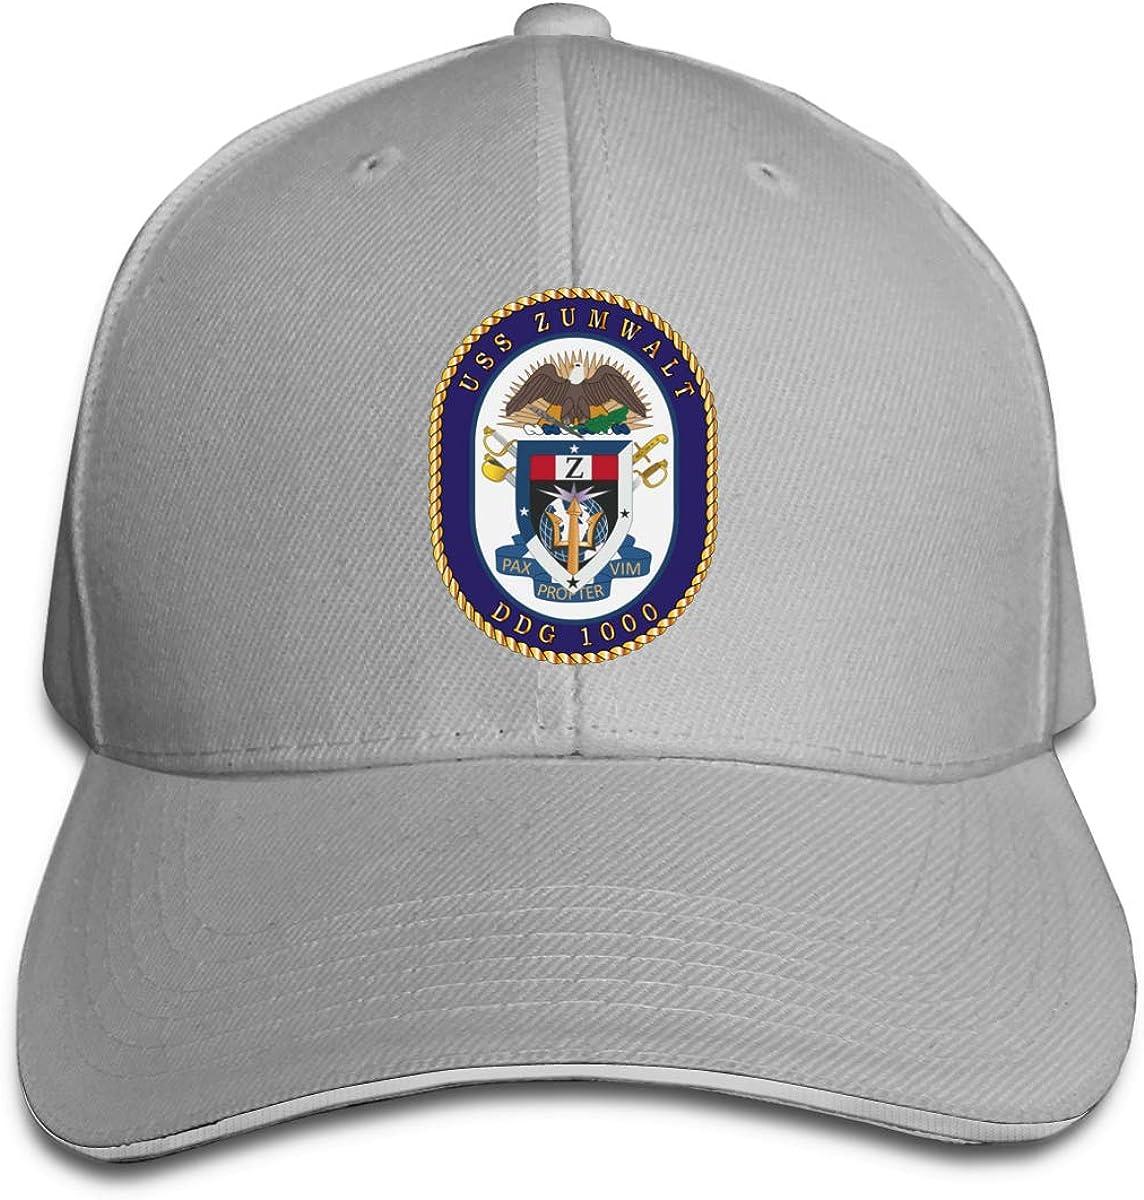 Navy USS Zumwalt DDG 1000 Wo Txt Unisex Adult Baseball Caps Adjustable Sandwich Caps Jeans Caps Adjustable Denim Trucker Cap